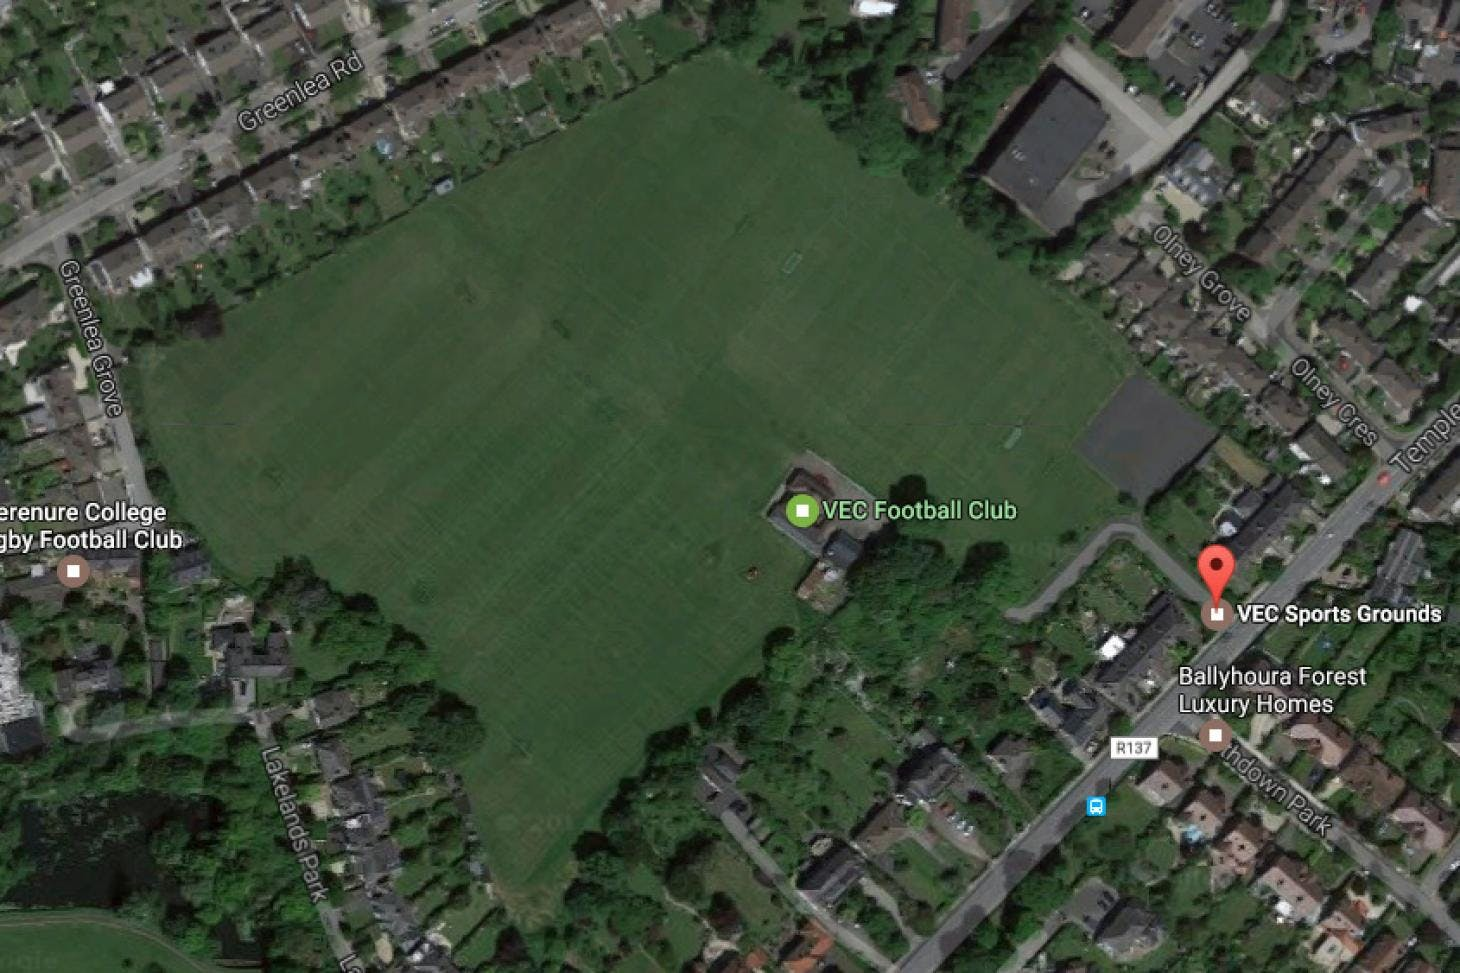 VEC Sports Grounds 11 a side | Grass football pitch